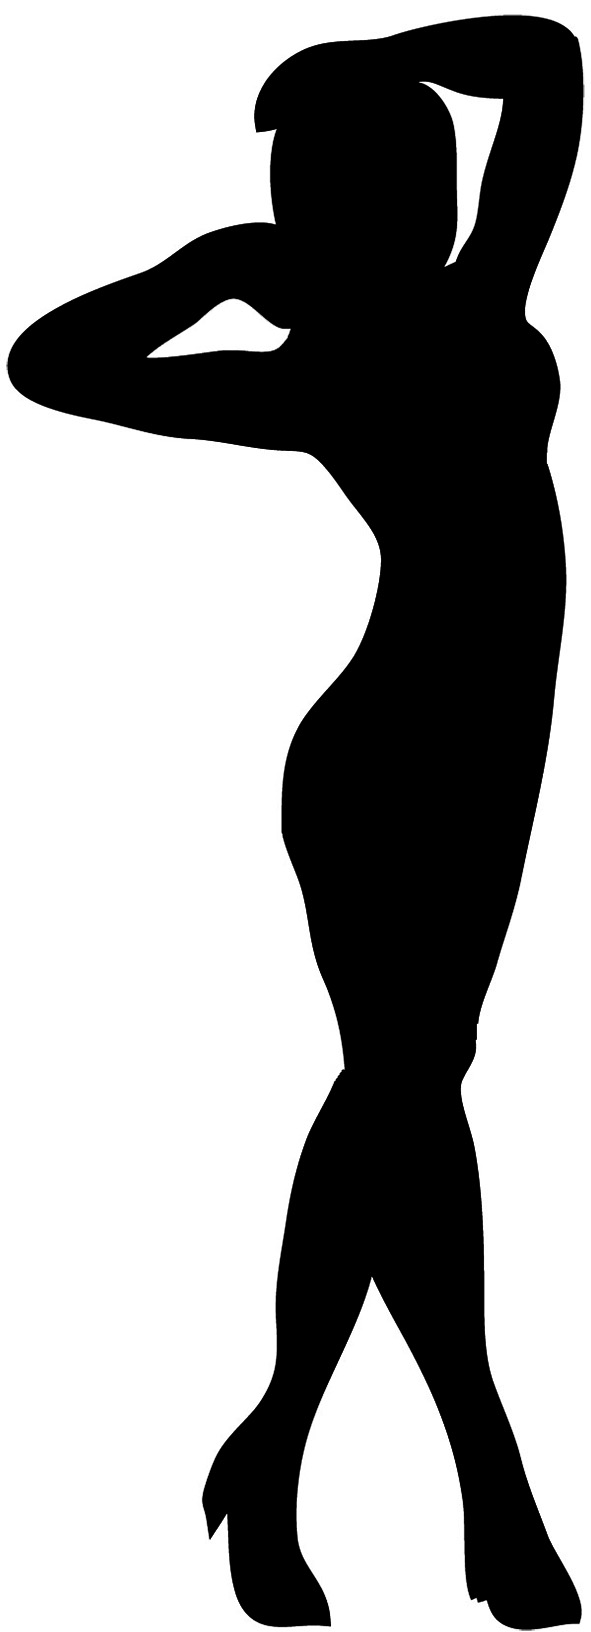 591x1632 Clip Art Pin Up Girl Silhouette Clip Art